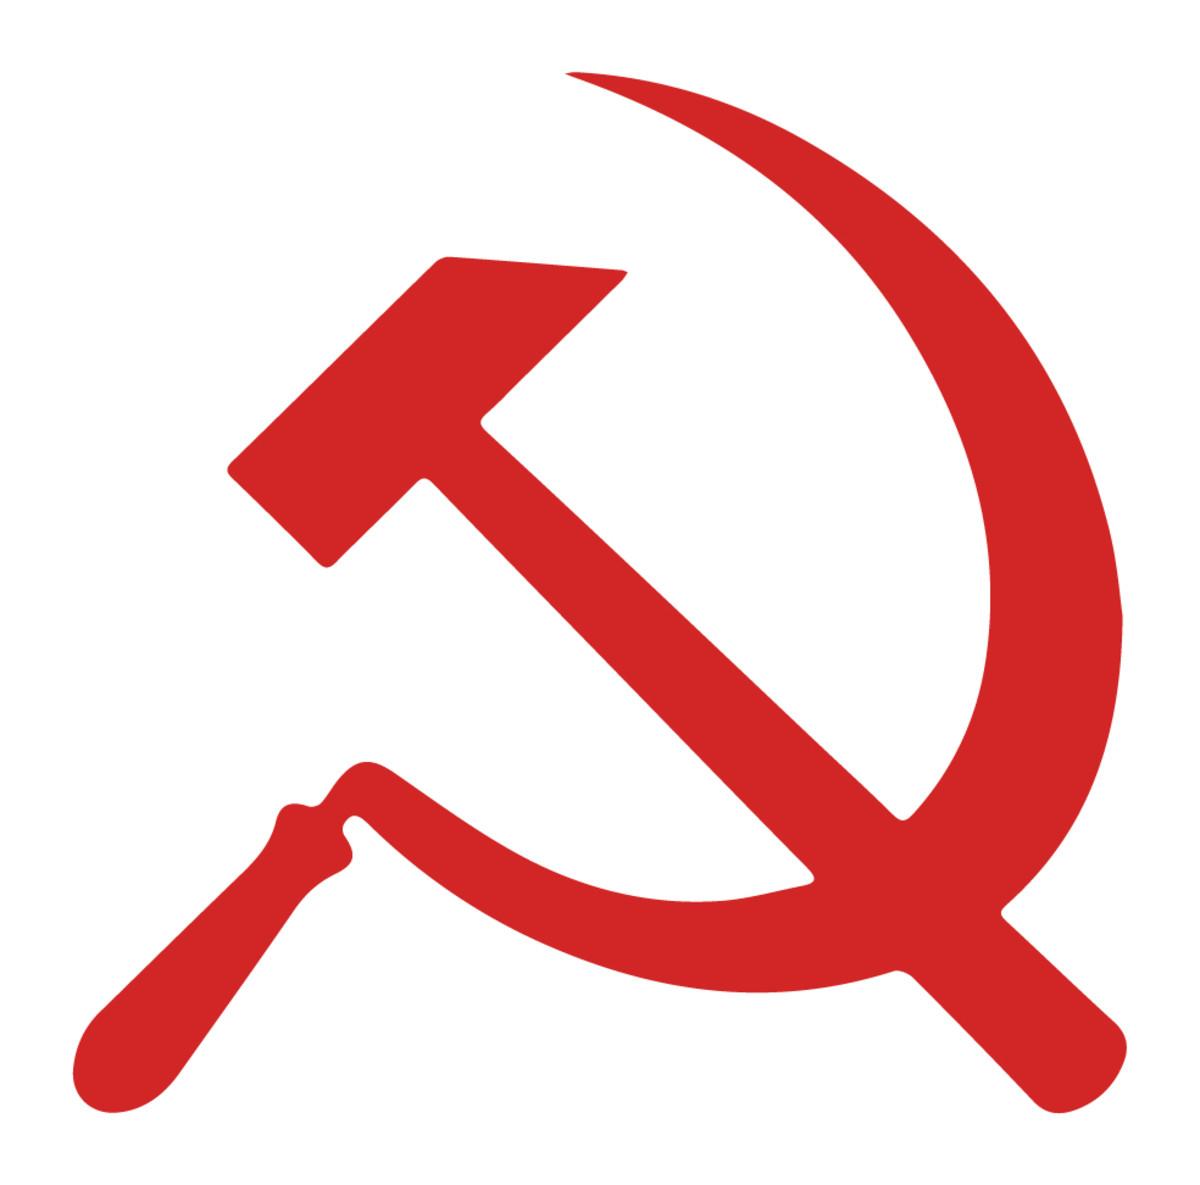 Symbol of the Soviet Union